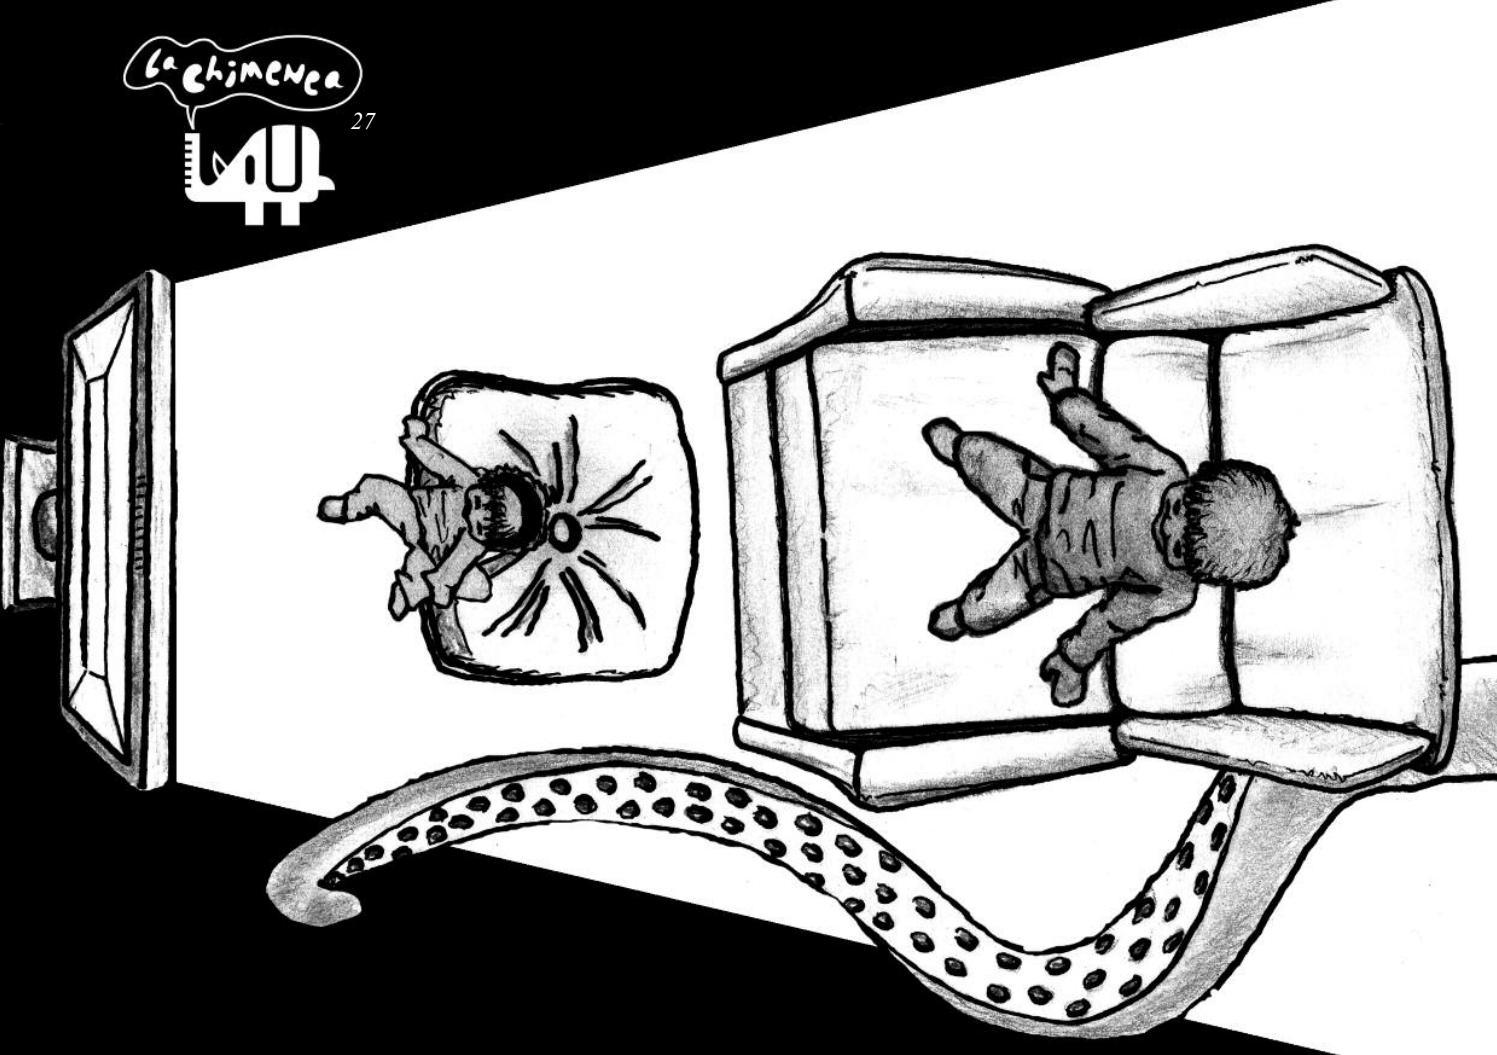 Lcf#27 by La chimenea fanzine - issuu